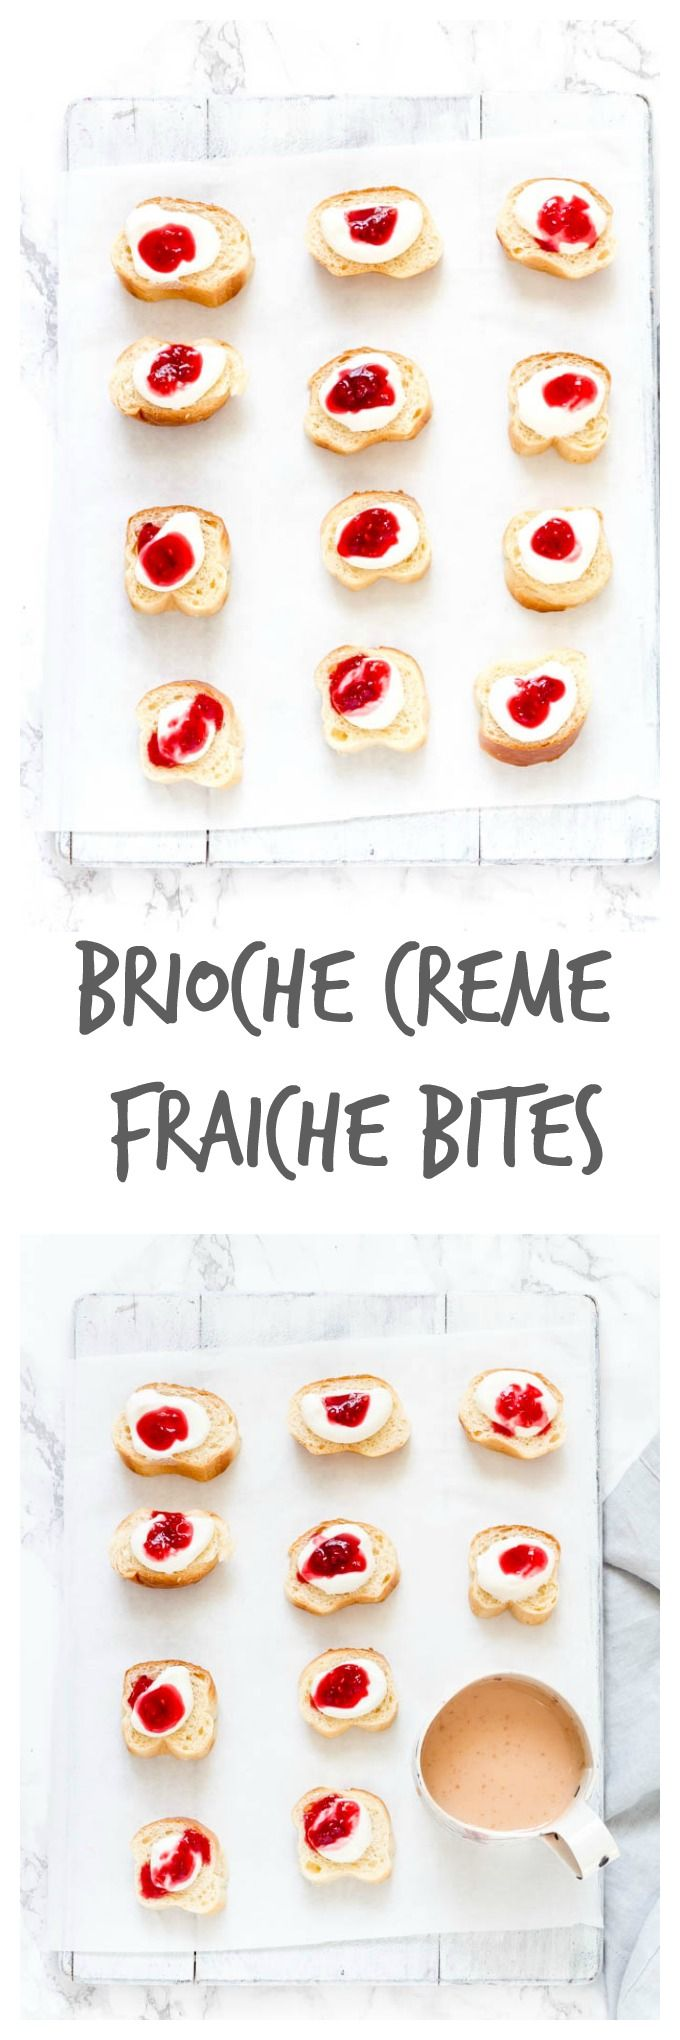 Brioche Creme Fraiche Bites   Recipes From A Pantry